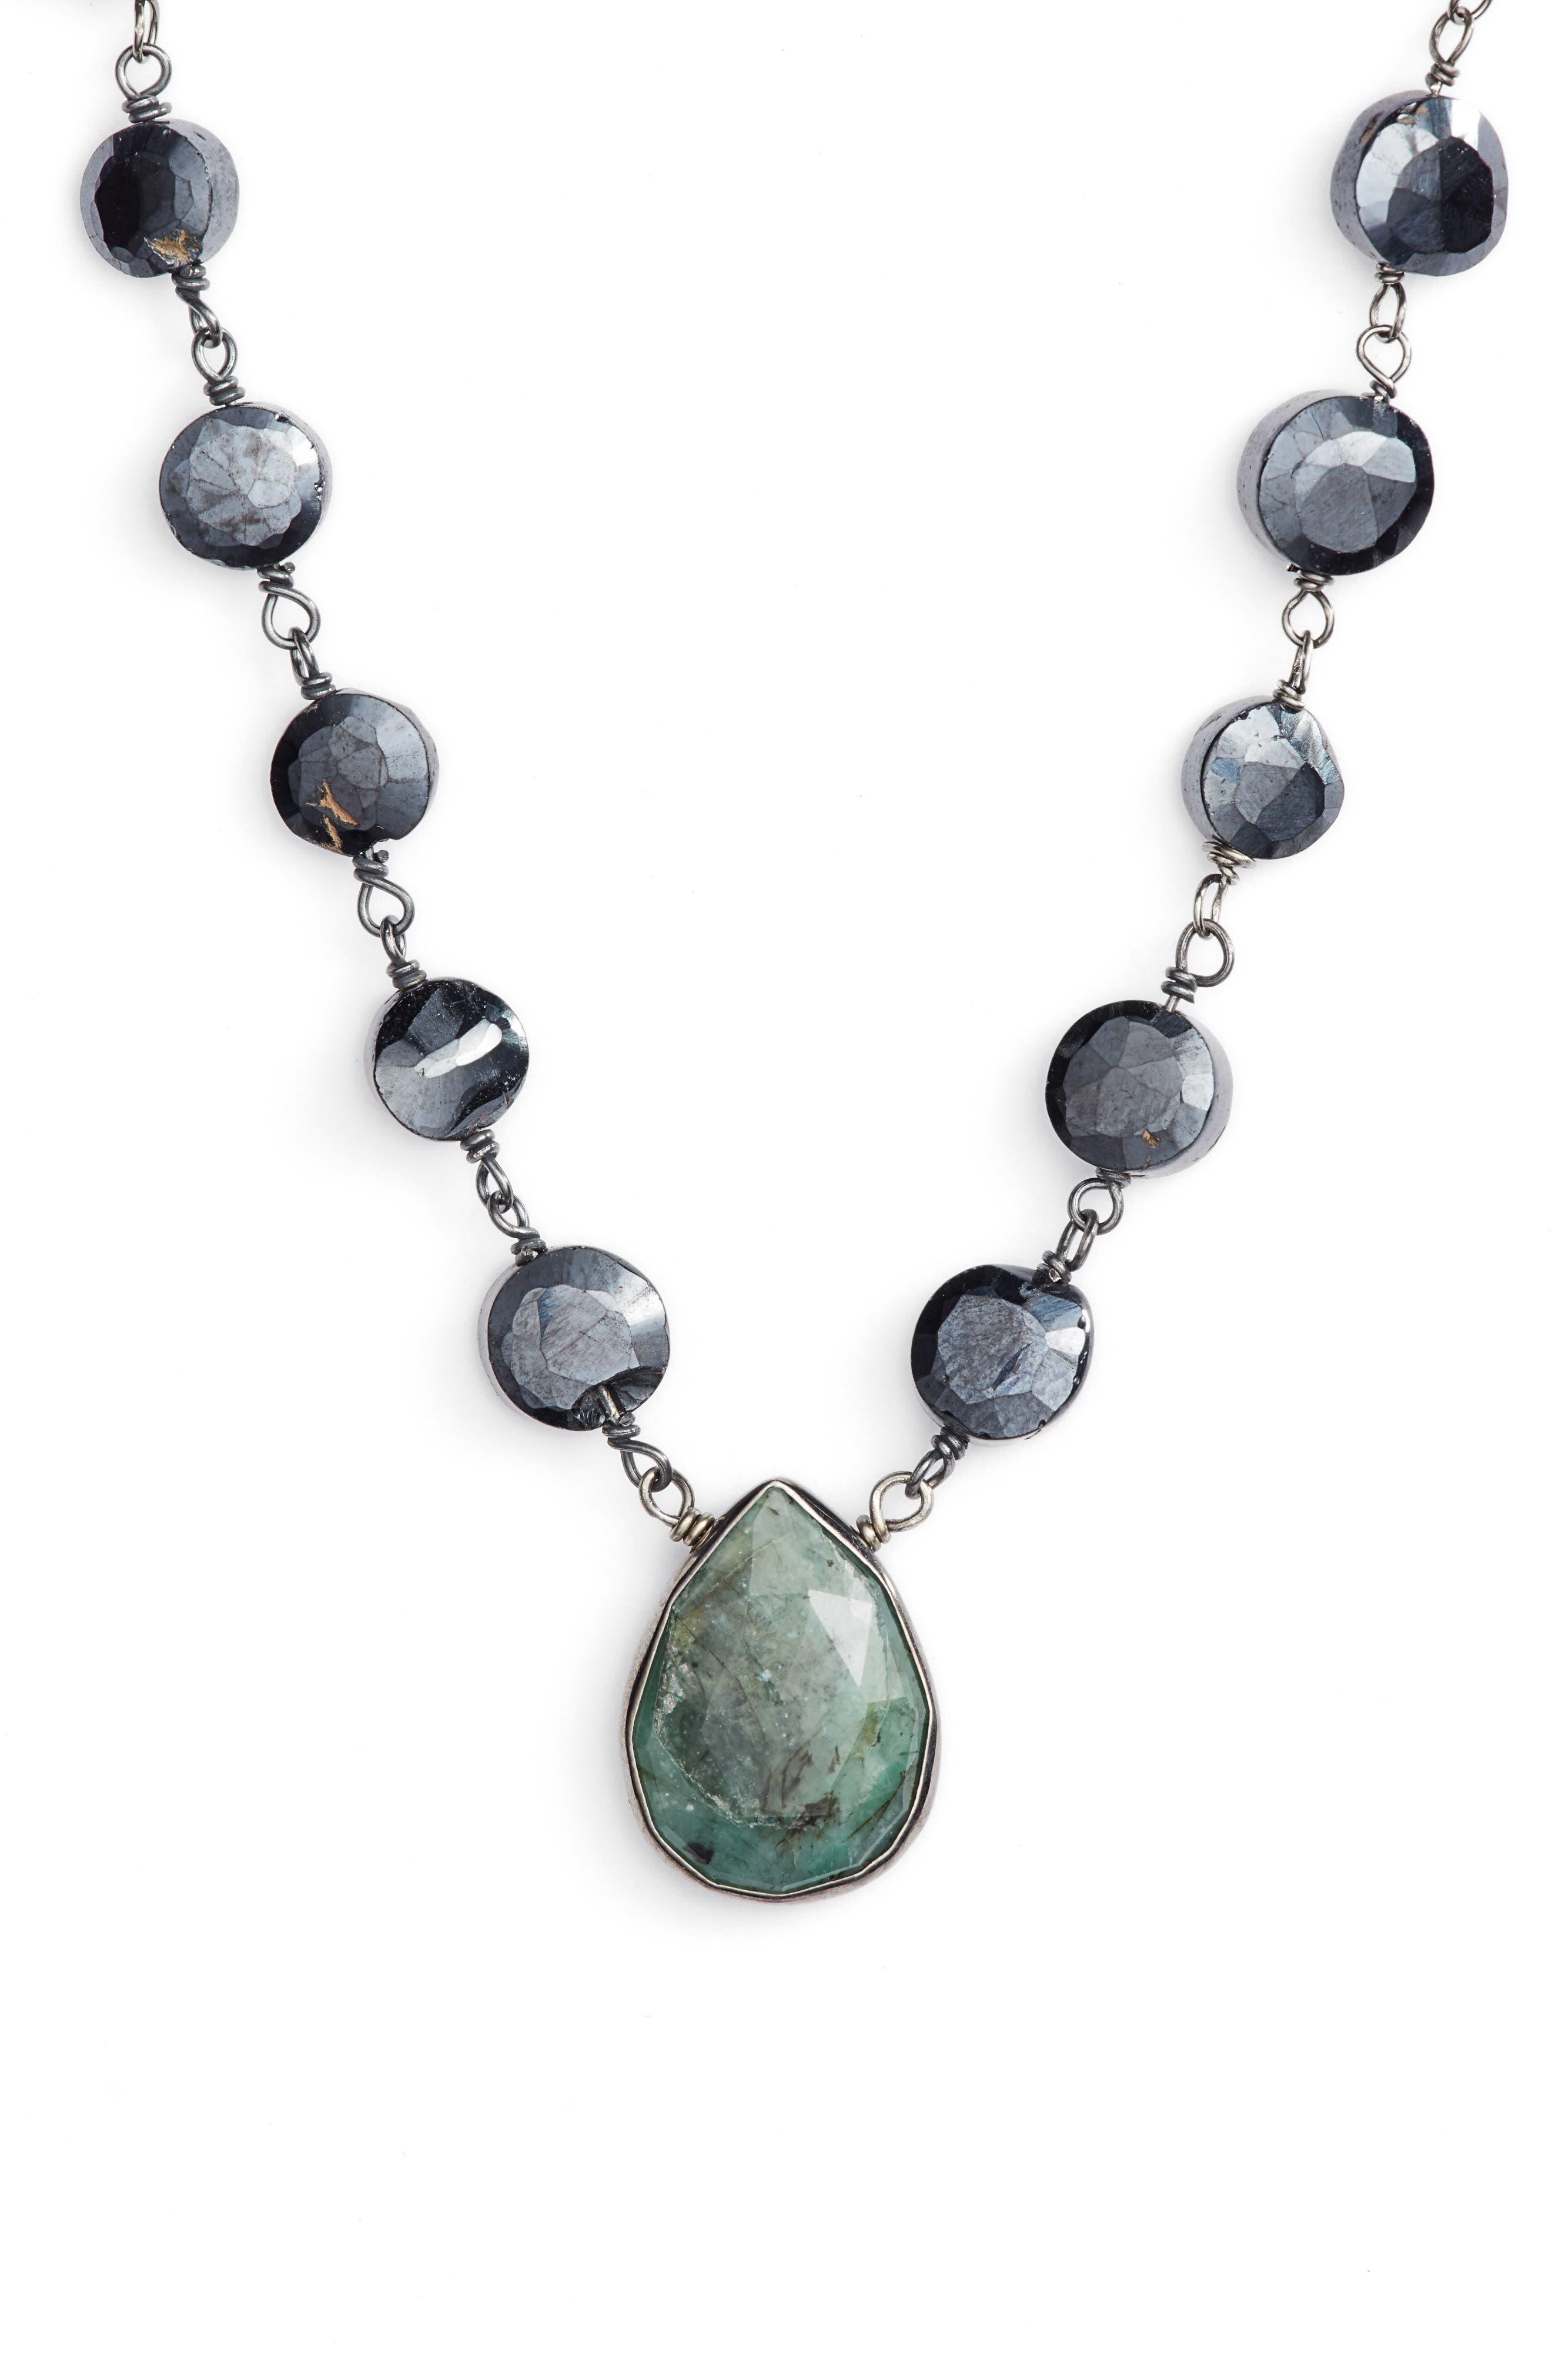 Ara Collar Necklace,                             Main thumbnail 1, color,                             MYSTIC BLACK SPINEL/ EMERALD